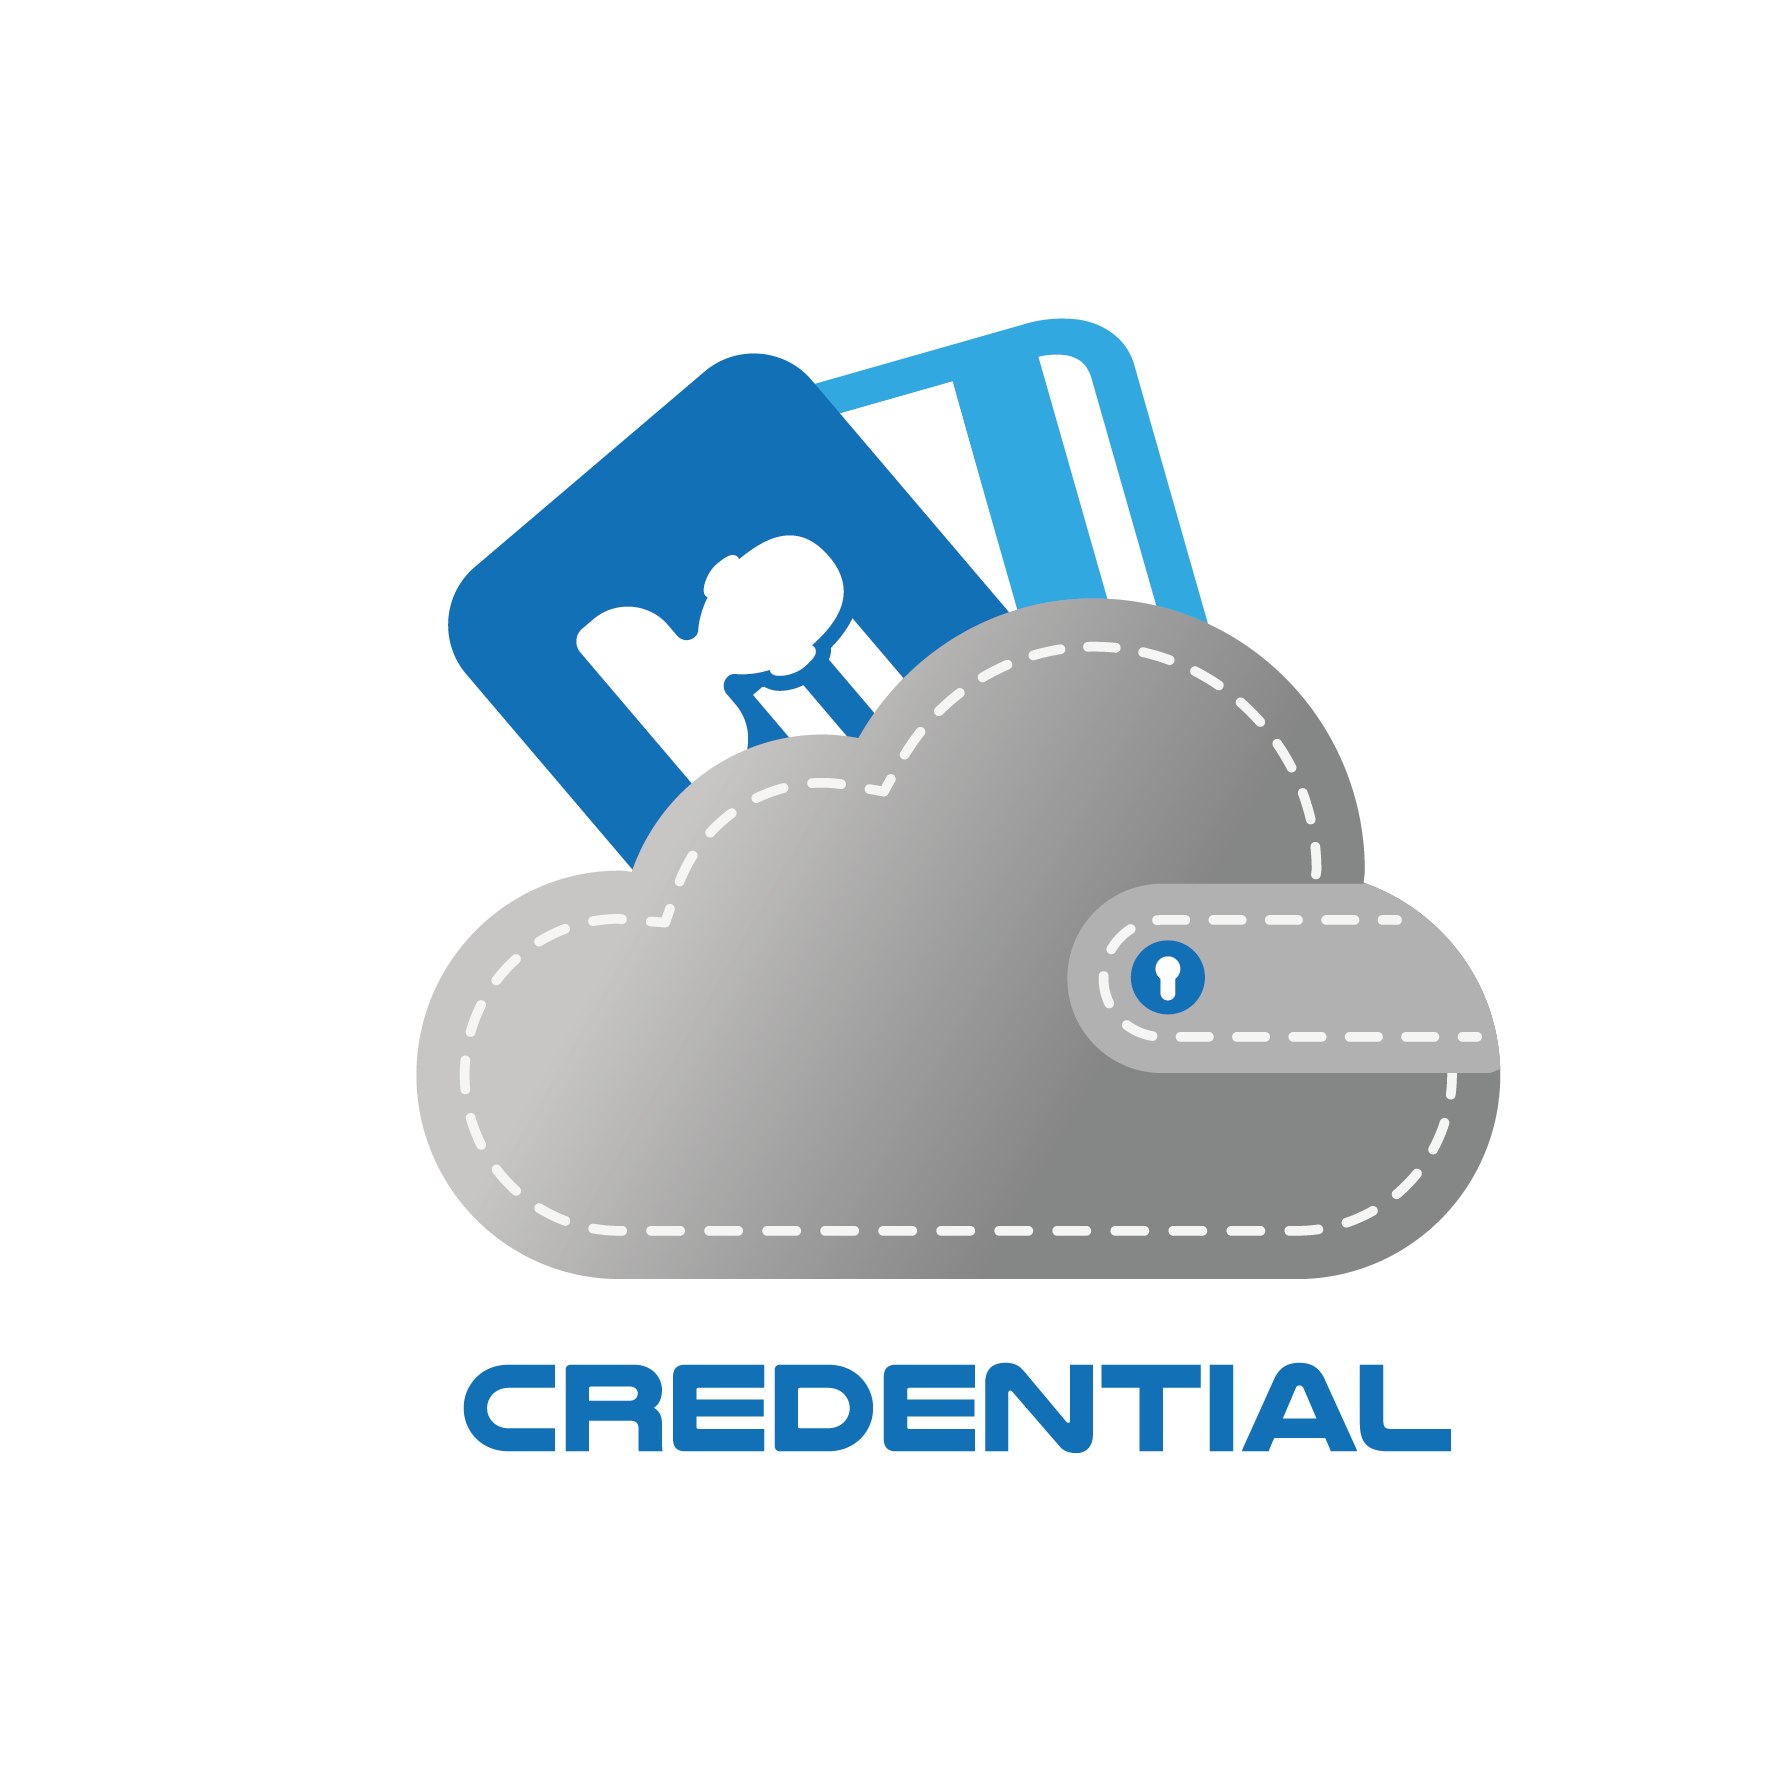 Logo_CREDENTIAL_FINAL-04